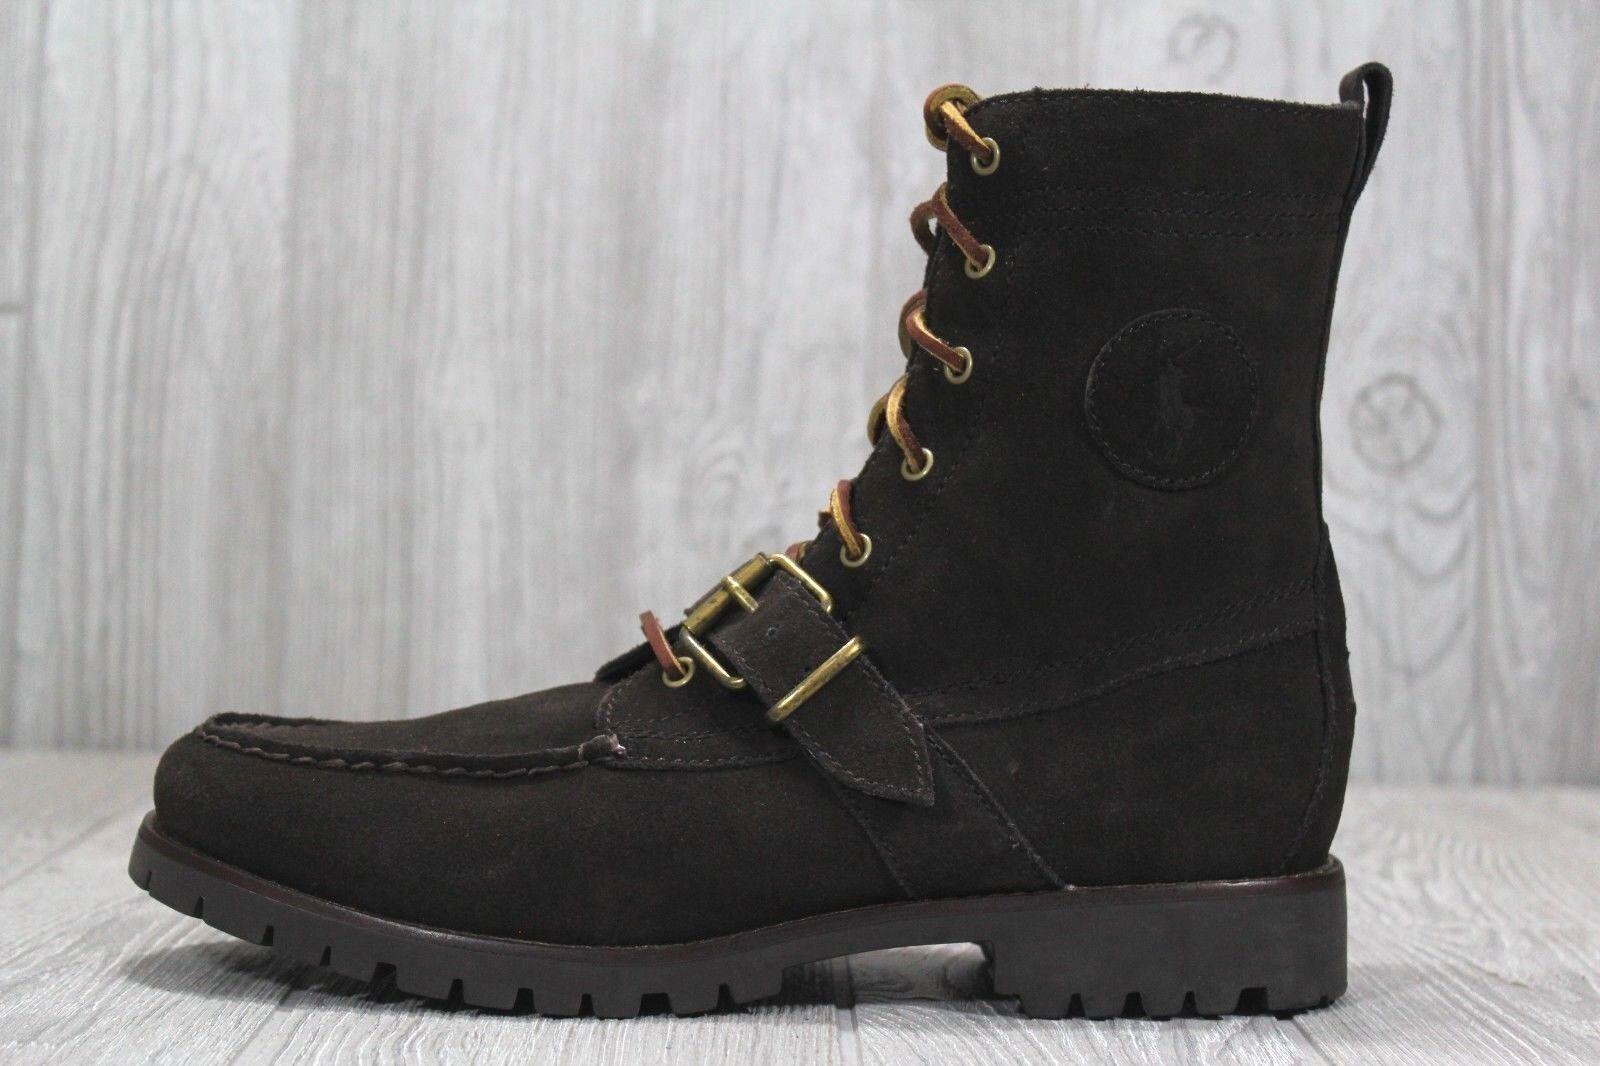 36 Polo Ralph Lauren Ranger Suede Strap Military Boots Brown Men's Sz 9.5 11 14